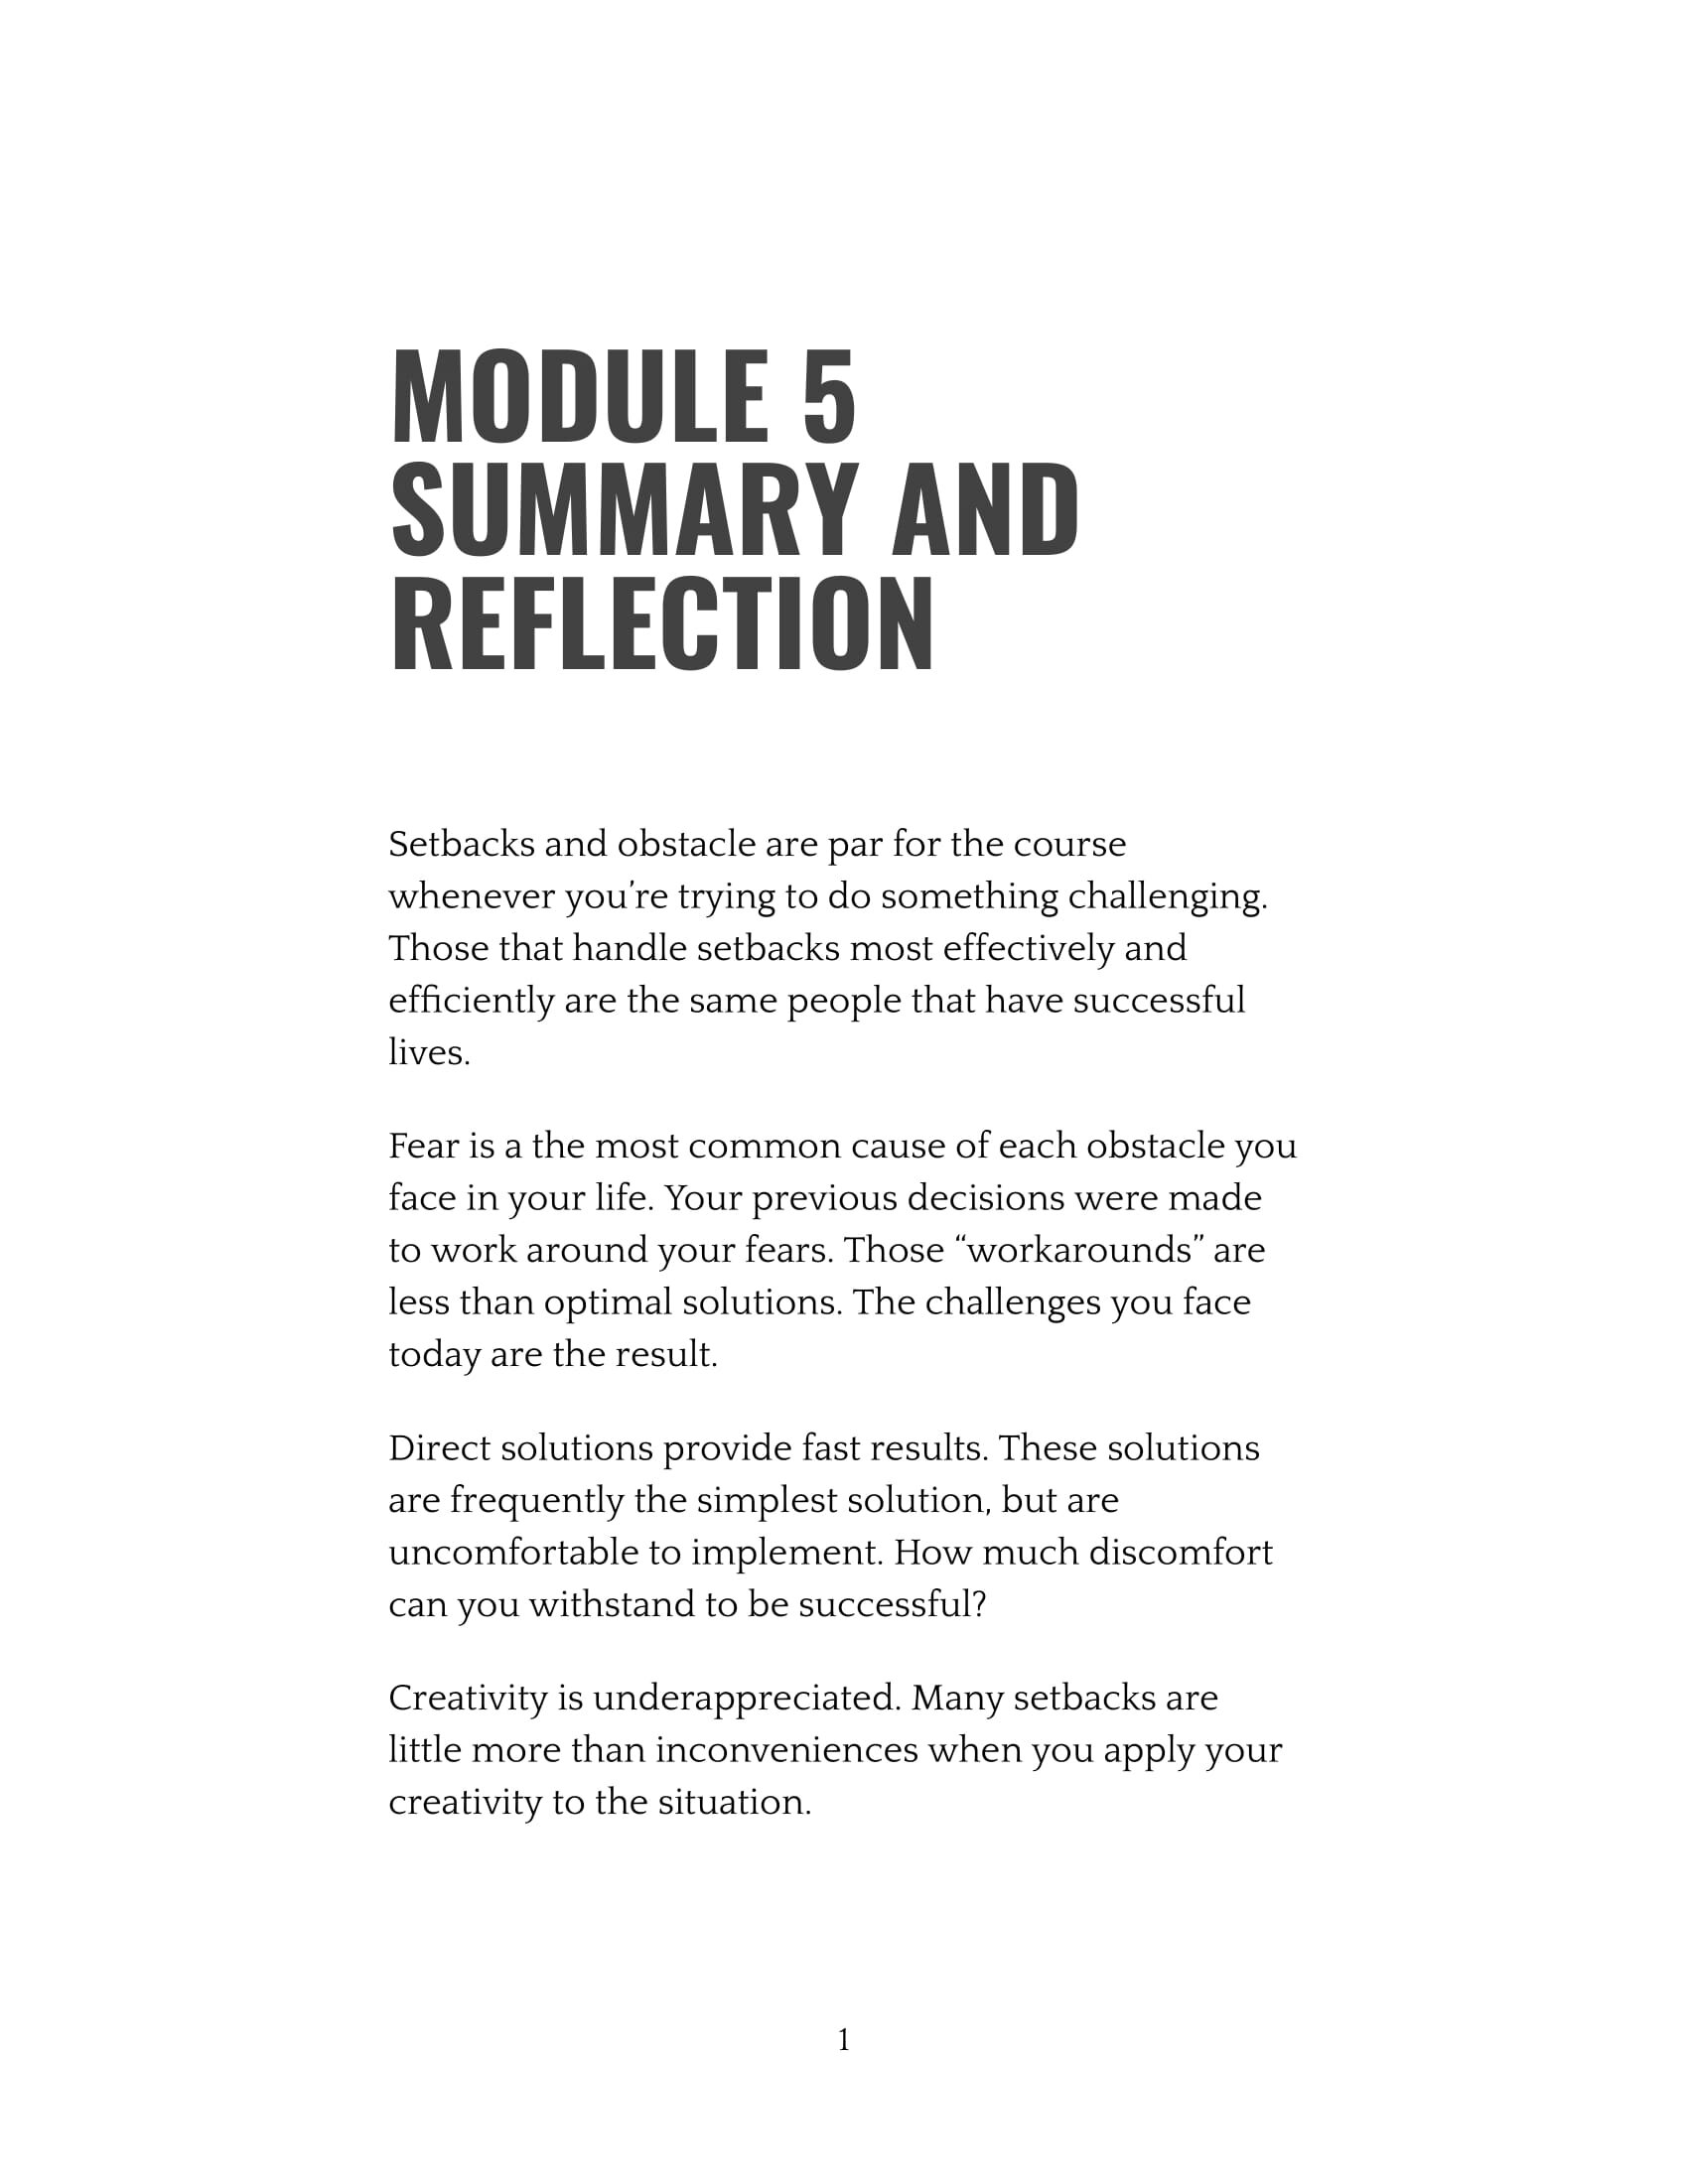 Module 1 Summary And Reflection-1.jpg